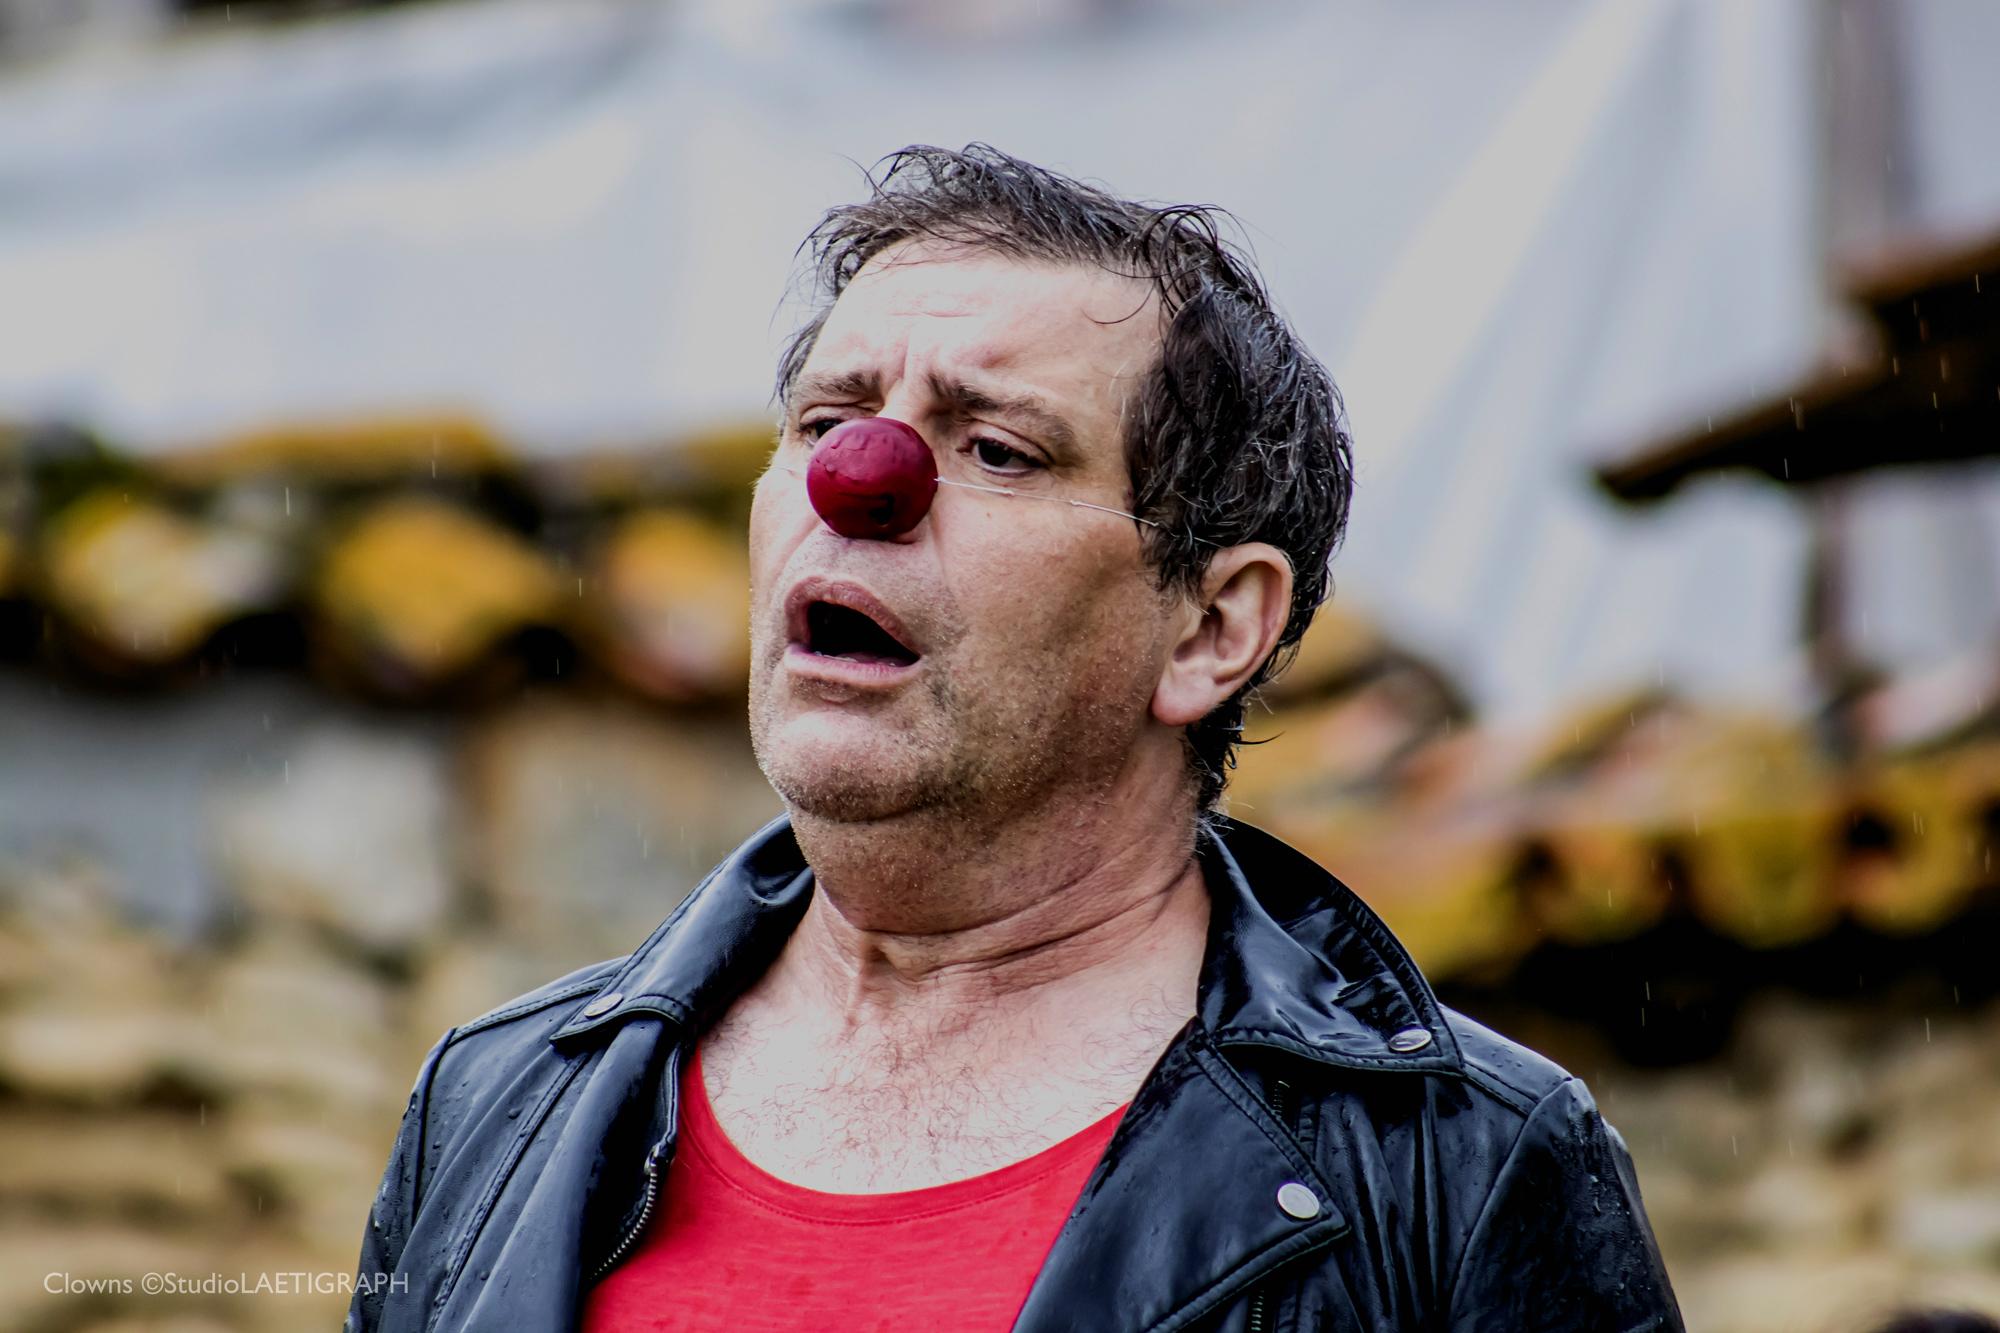 LMDCB21_clowns-45_1